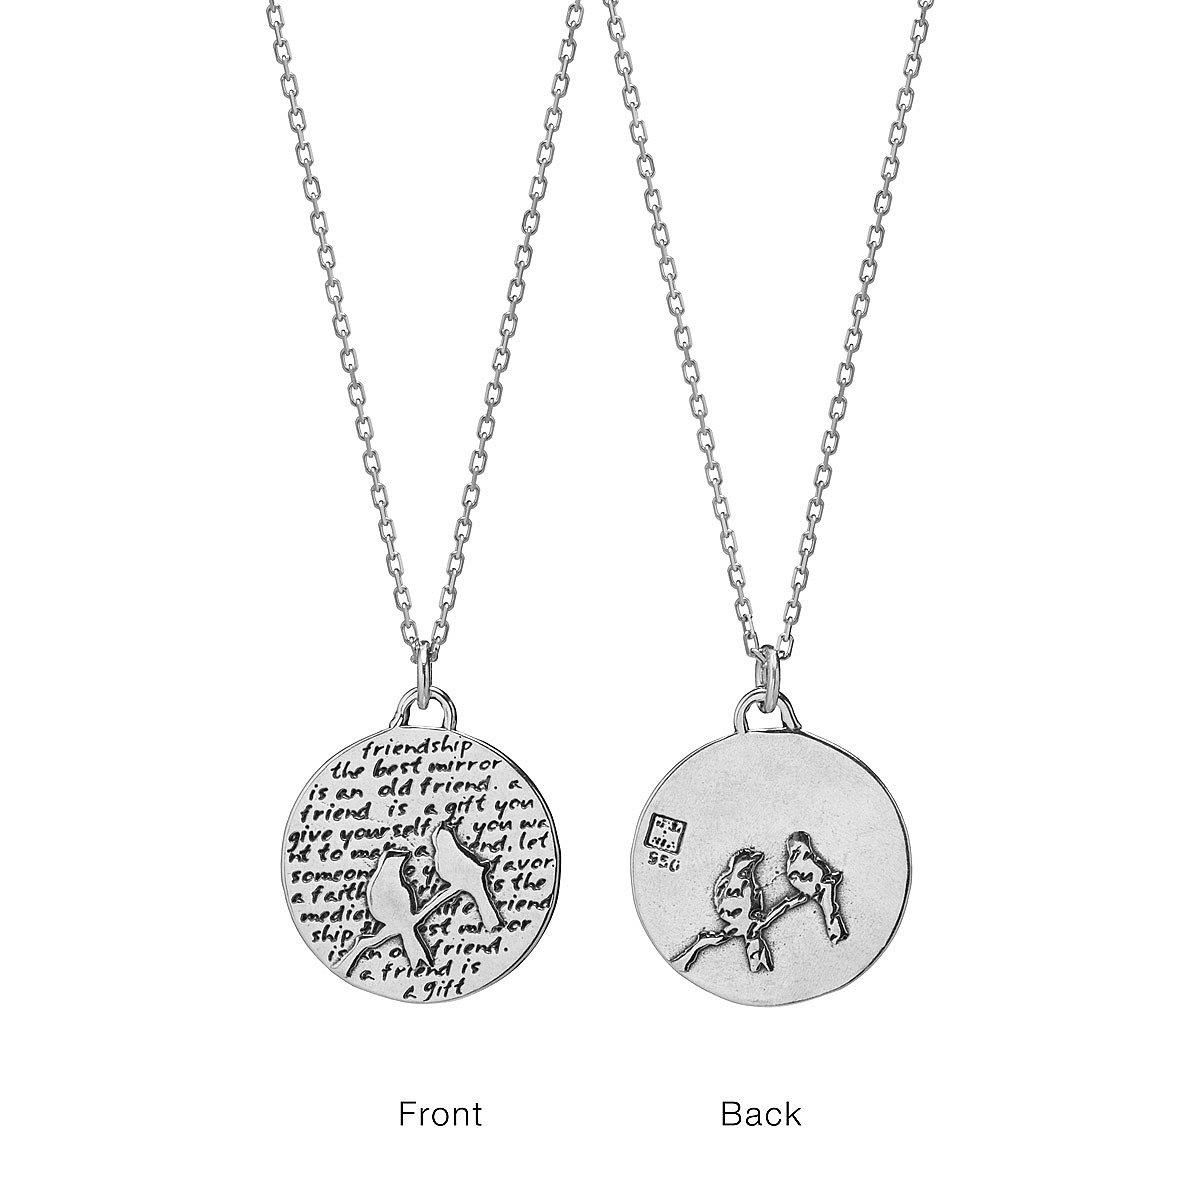 Friendship inspirational pendant inspirational jewelry handmade friendship inspirational pendant 1 thumbnail aloadofball Image collections